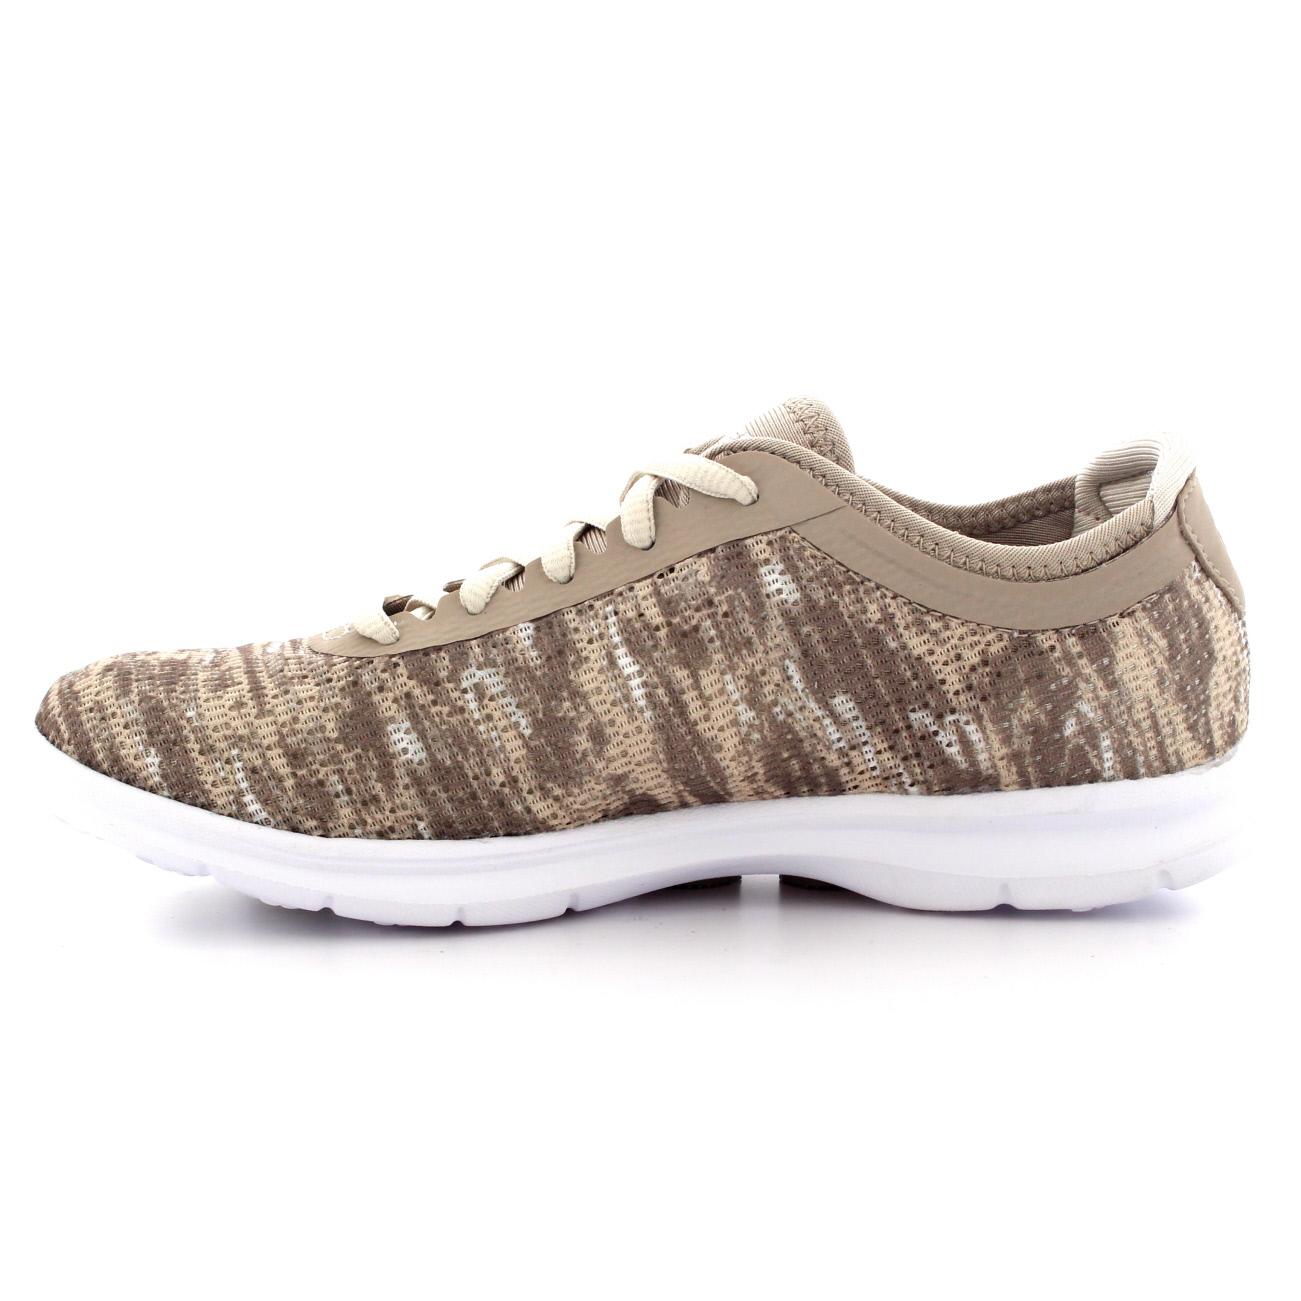 skechers yoga shoes, Skechers Casual